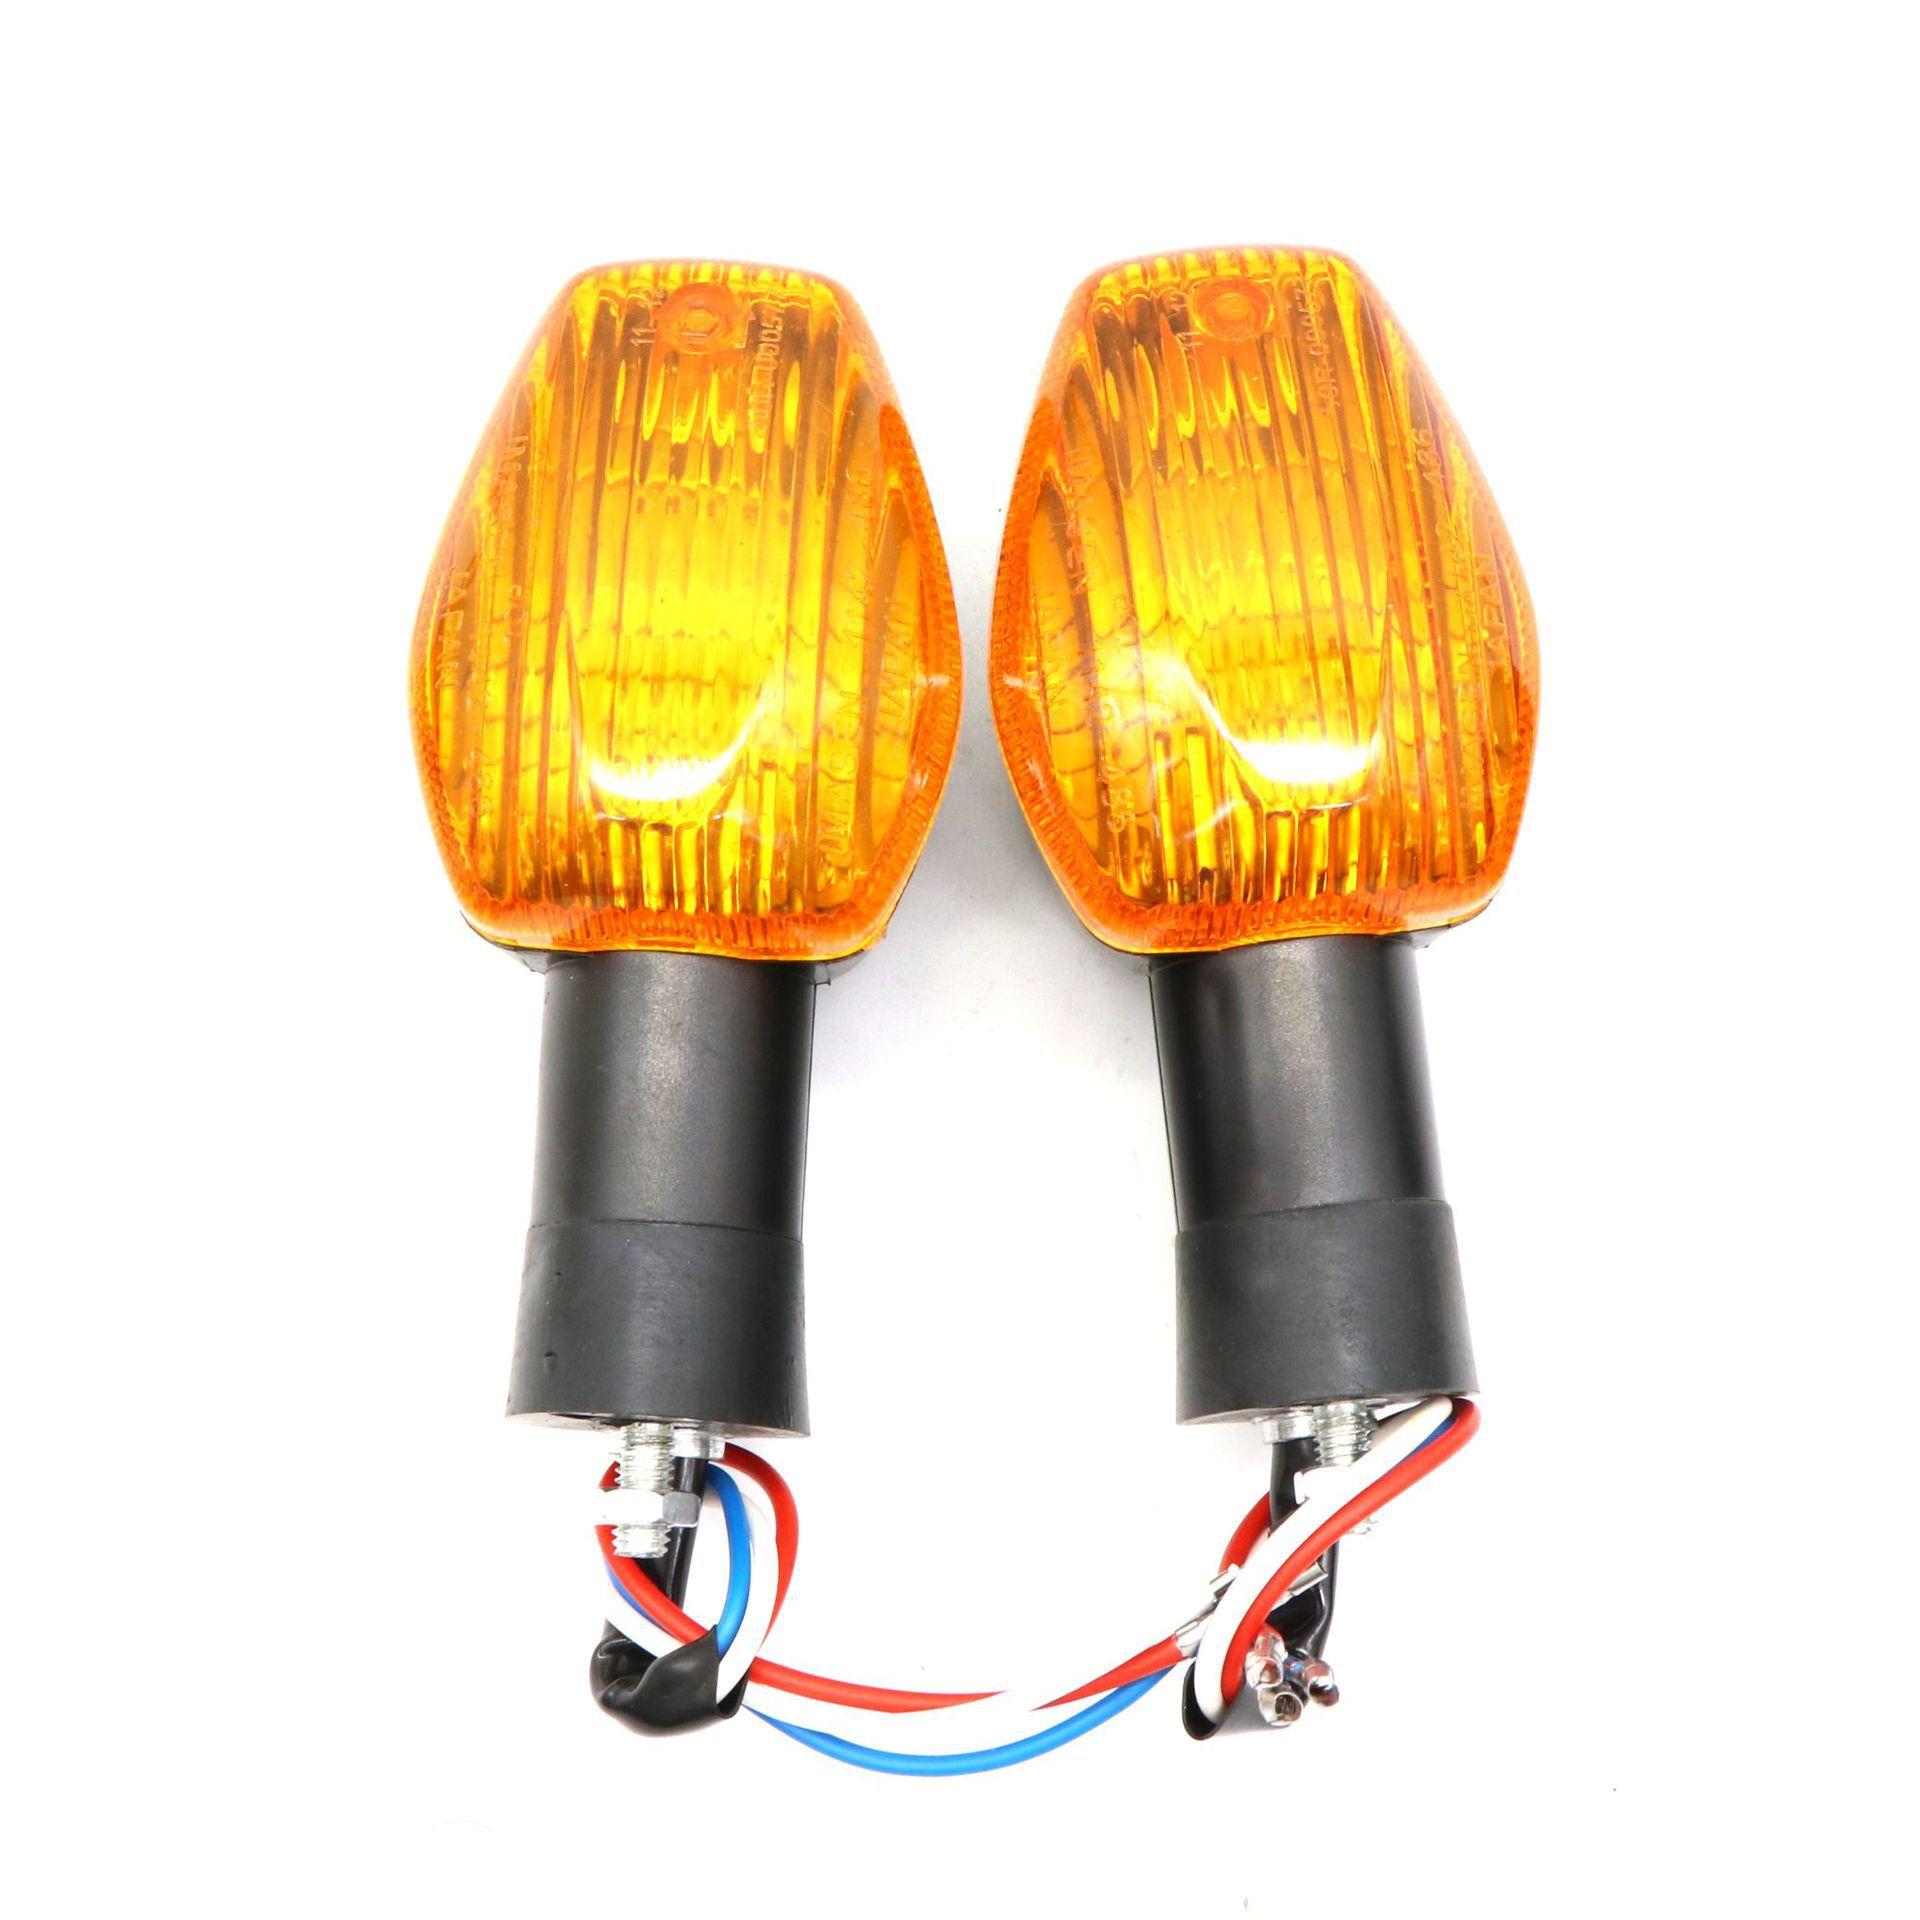 For HONDA CBR 600 CBR 1000RR CB 400 CB900 2002-2012 Motorcycle Modified Front Rear Turn Signal Indicator Warning Light Lamp Yellow shell